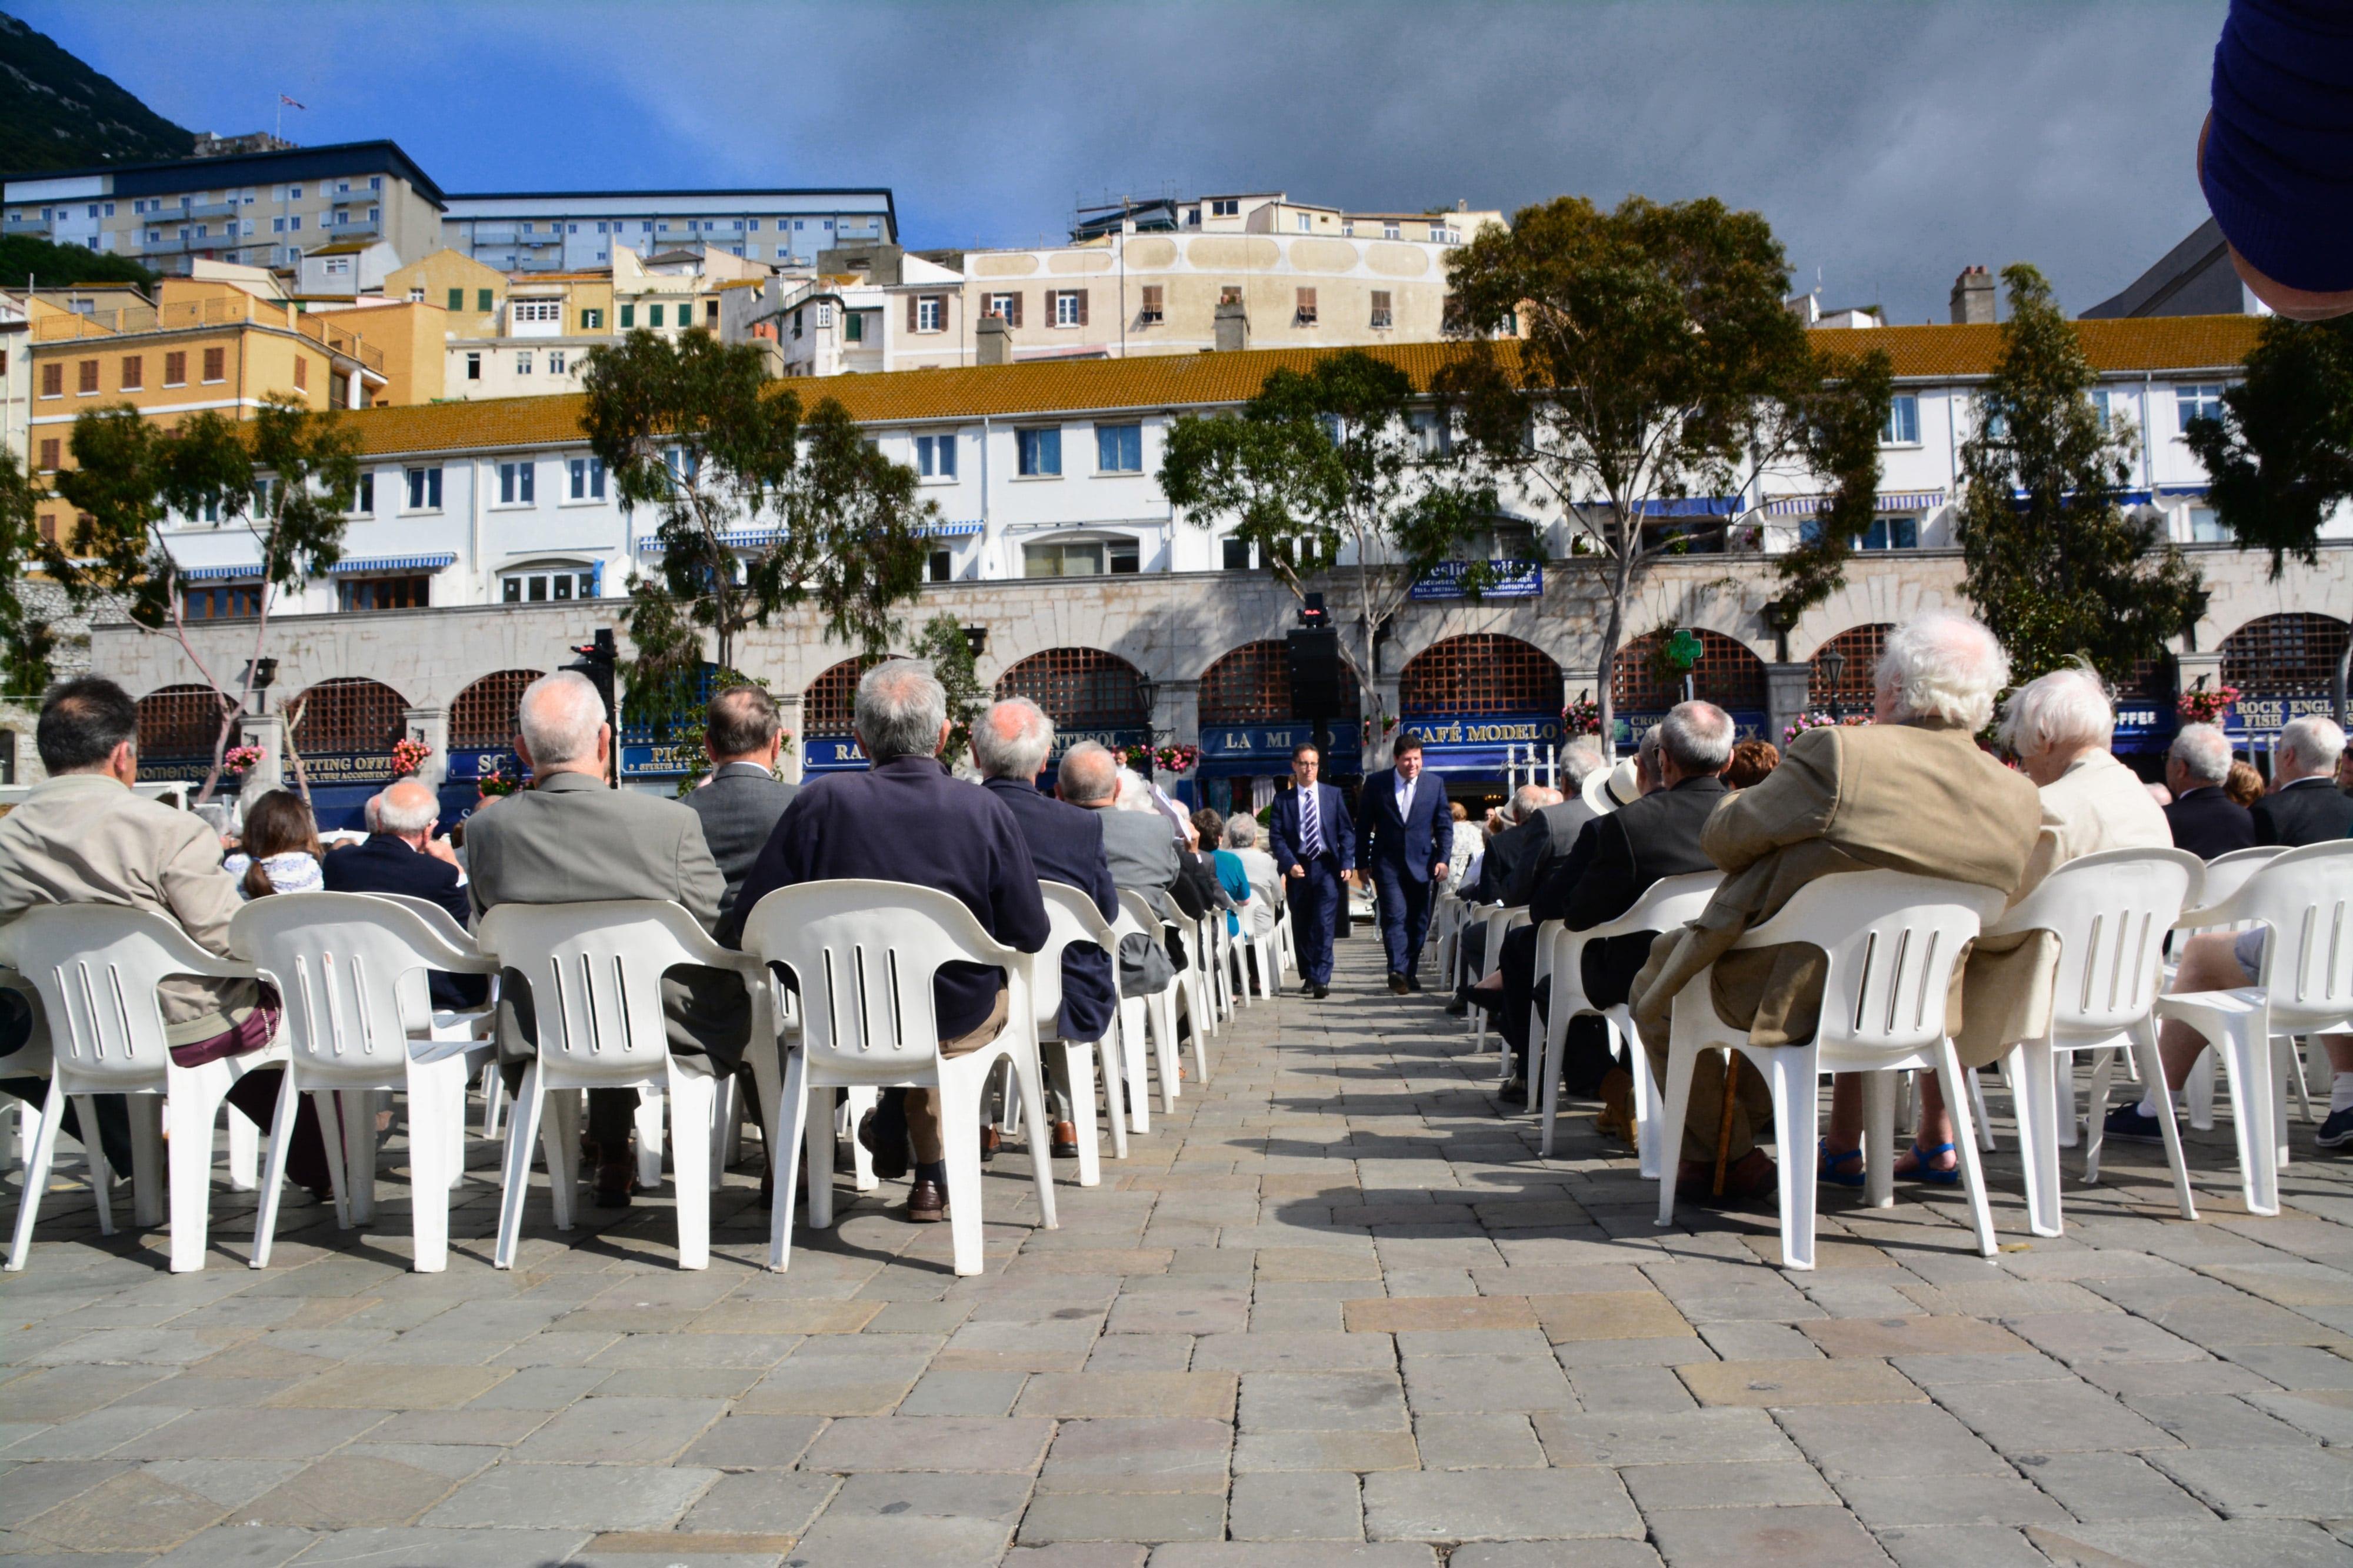 gibraltar-evacuation-dsc_3626_17816407758_o